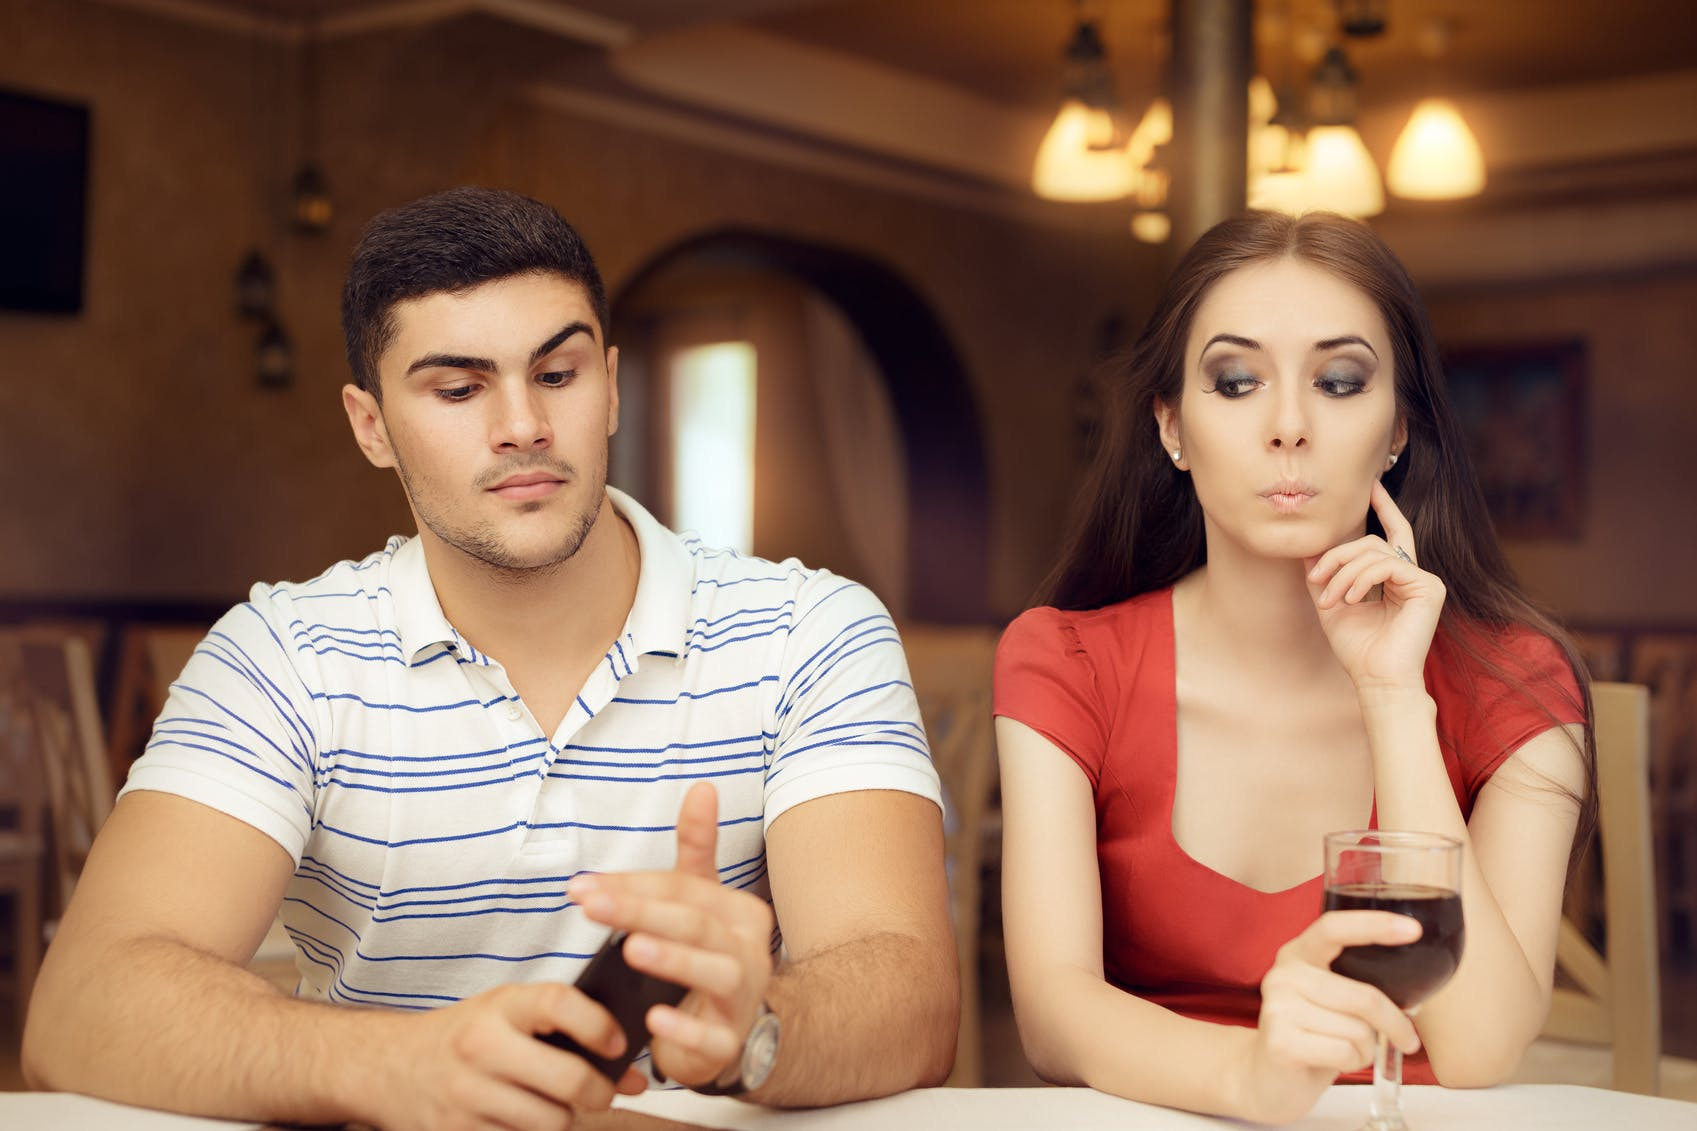 Tommelfingerregel dating